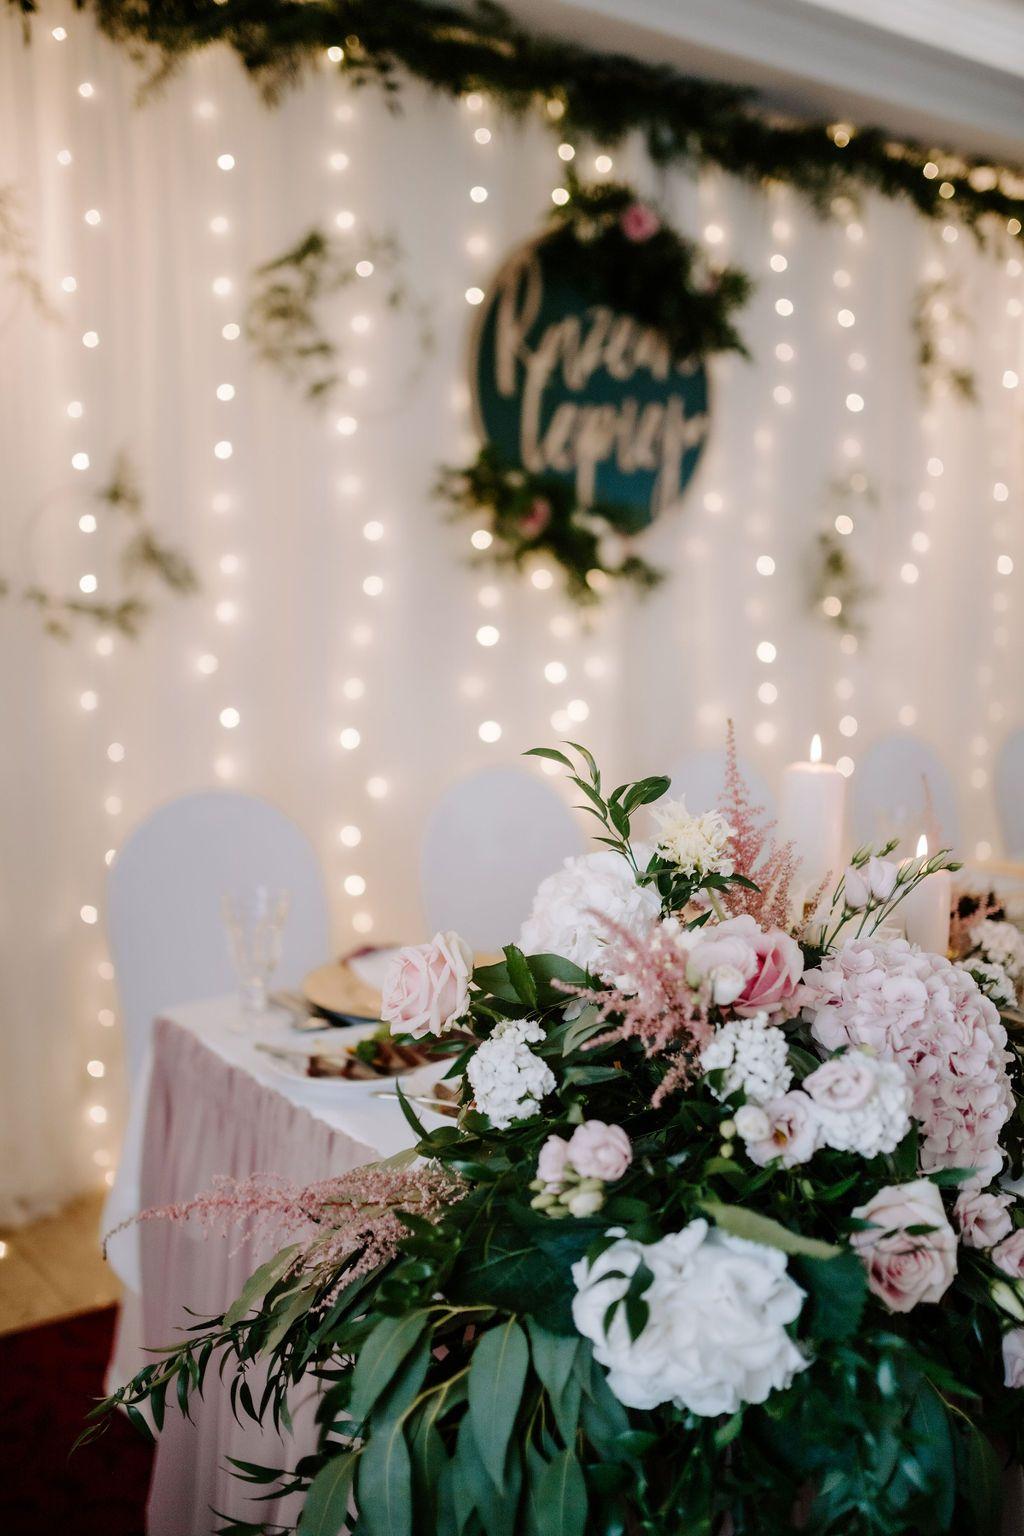 Girlanda Kwiatowa Table Decorations Decor Inlove